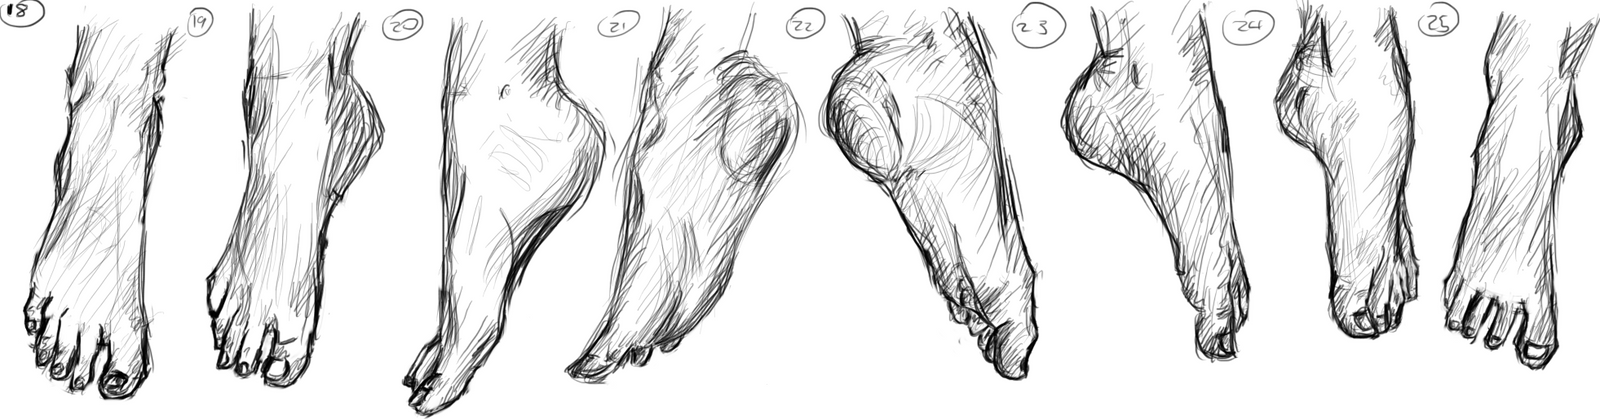 Feet (18-25) by muslacrima